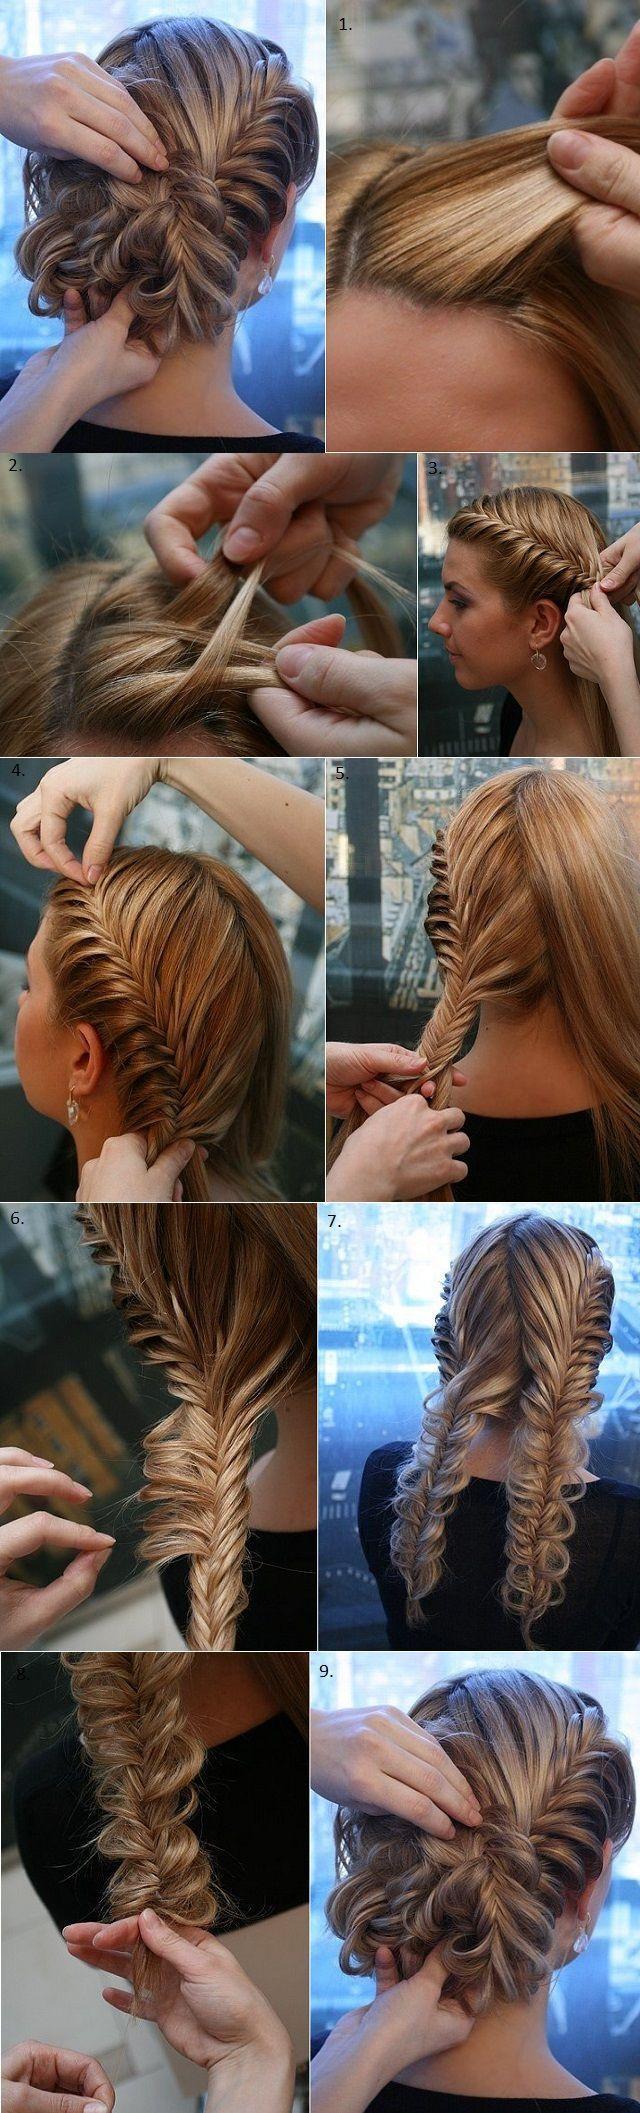 best Hair u makeup images on Pinterest Bridal hairstyles